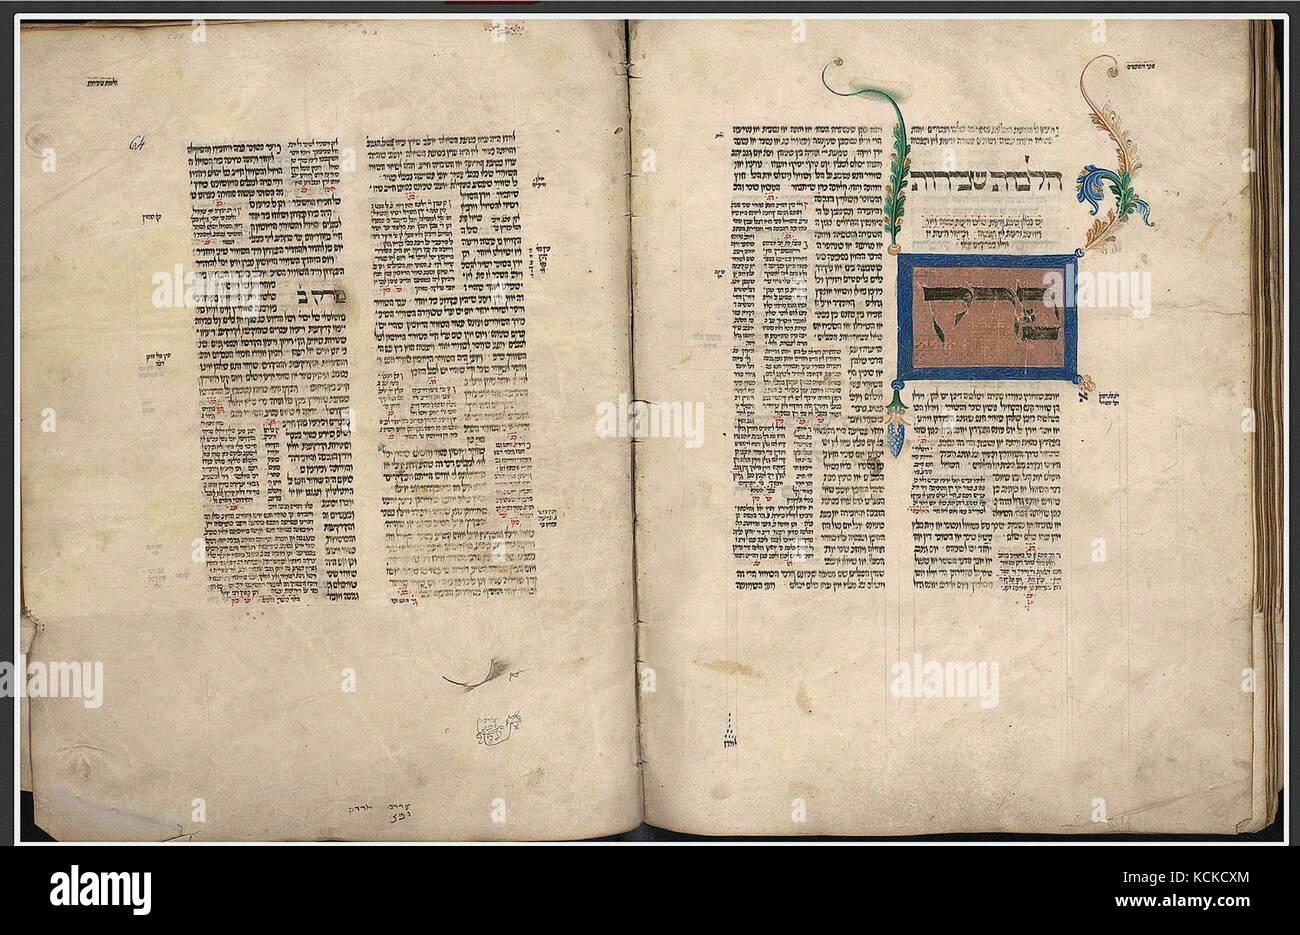 6083. Moses Maimonides, Mishneh Torah, 14th C. Hebrew manuscript from Italy. - Stock Image